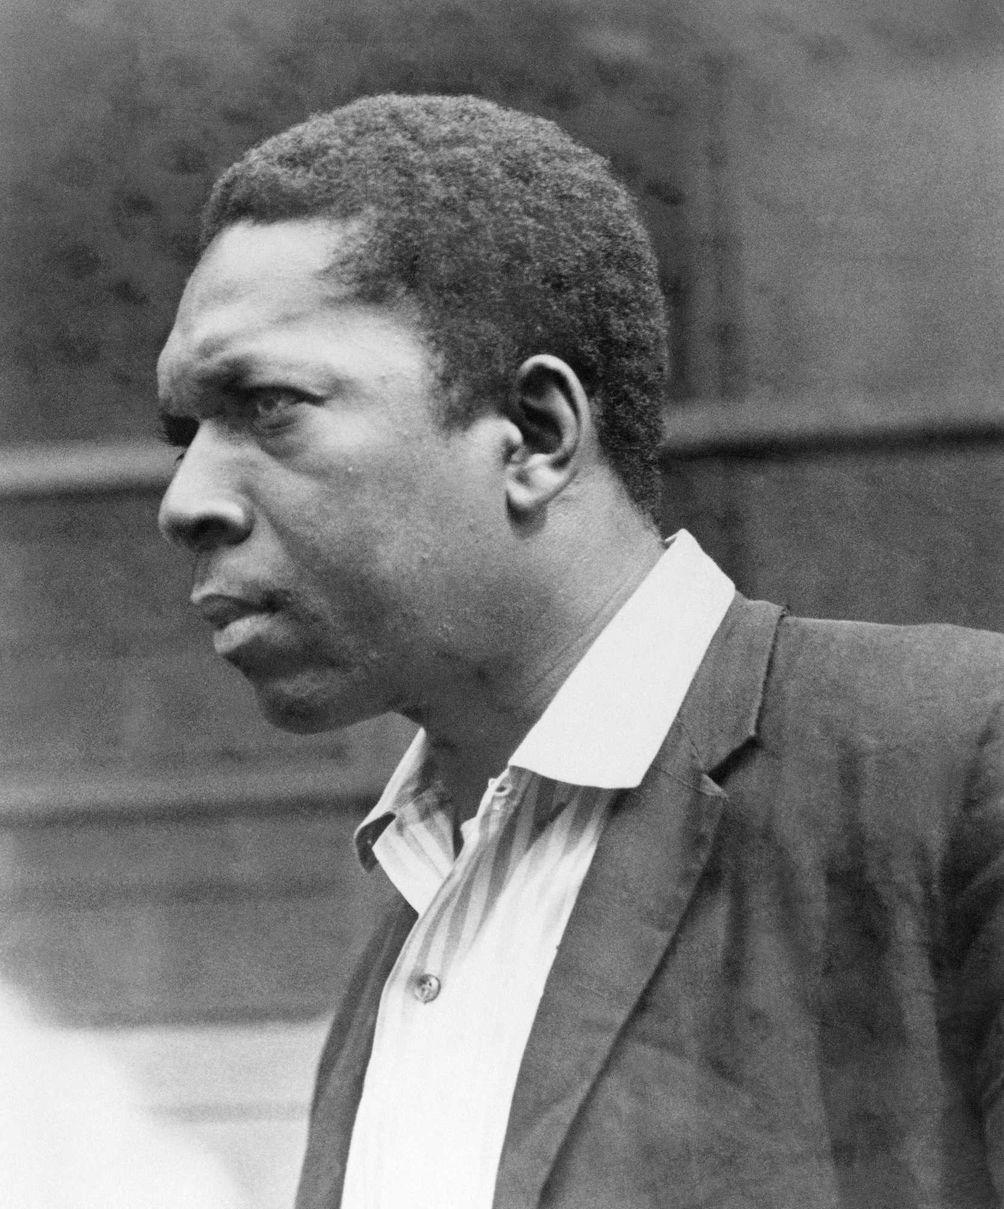 Jazz saxophonist John Coltrane lived in Dix Hills